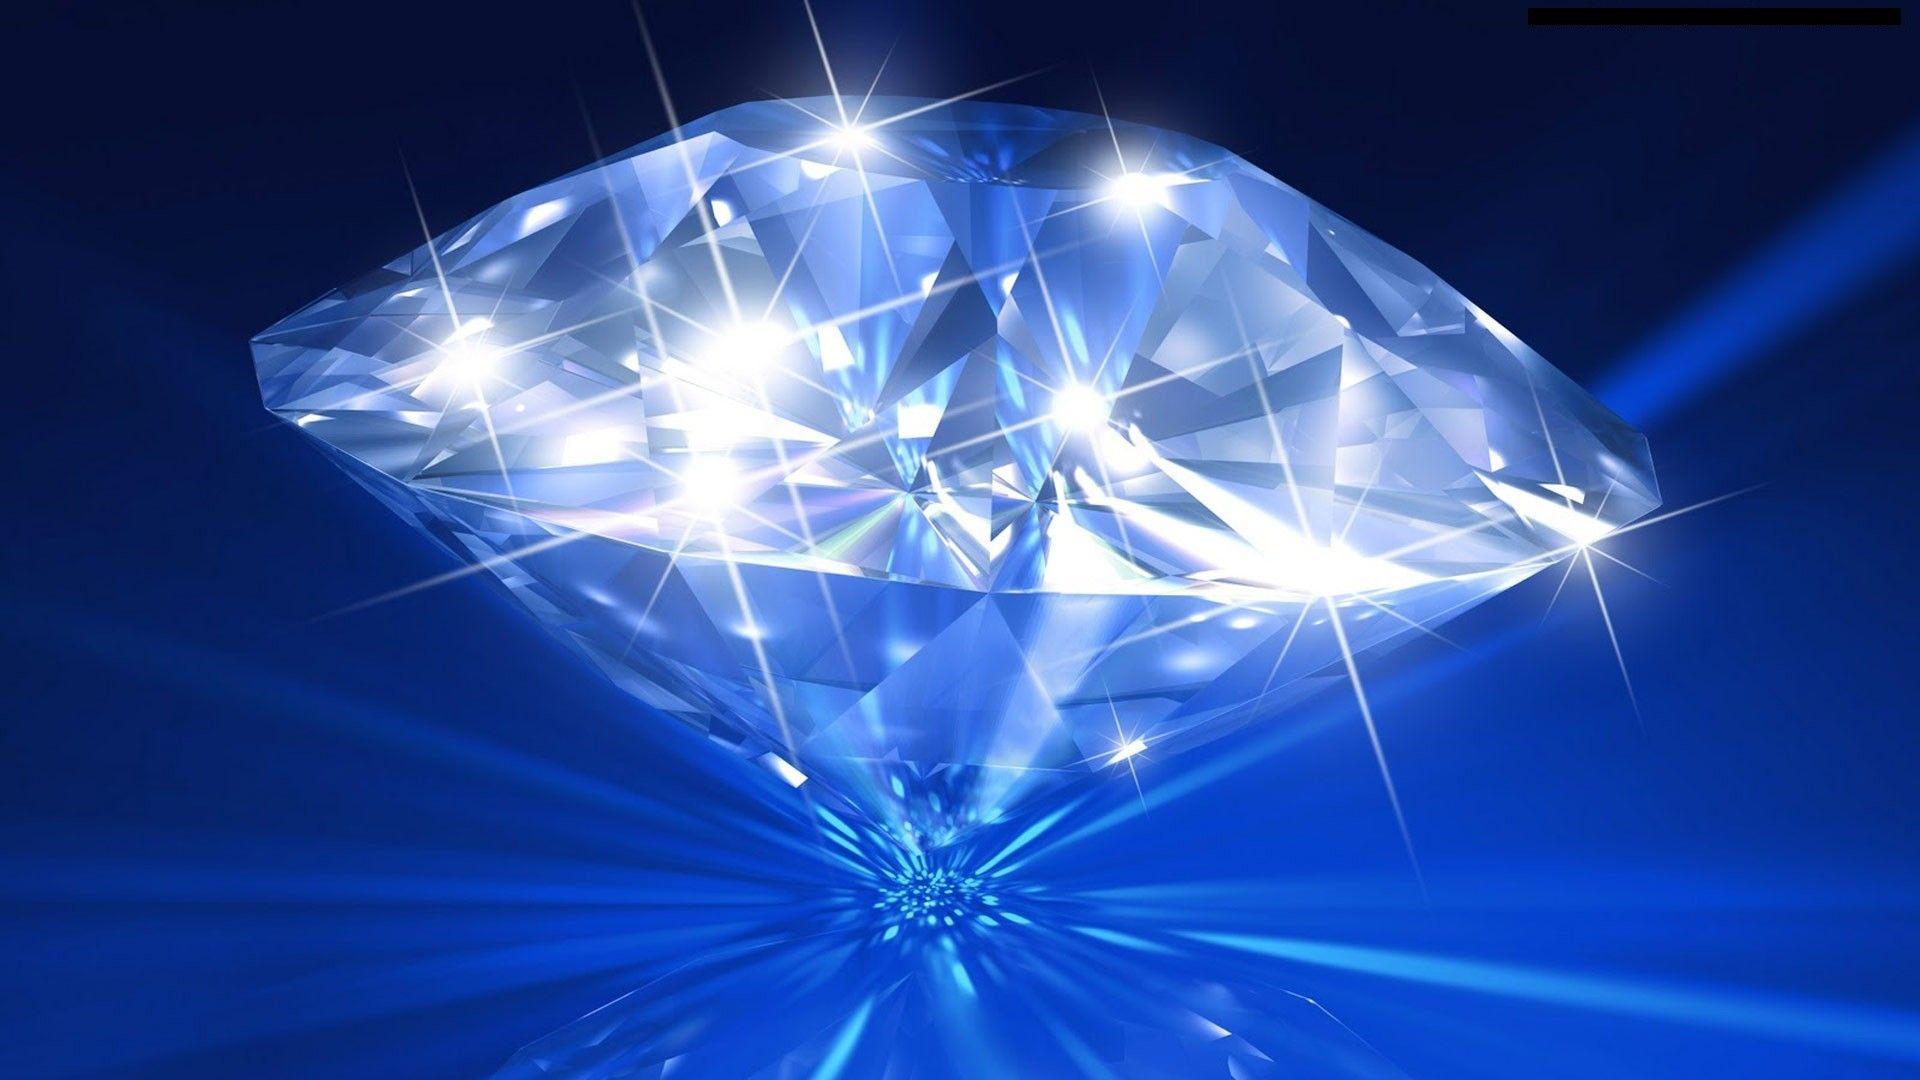 Blue Diamond Wallpapers Top Free Blue Diamond Backgrounds Wallpaperaccess